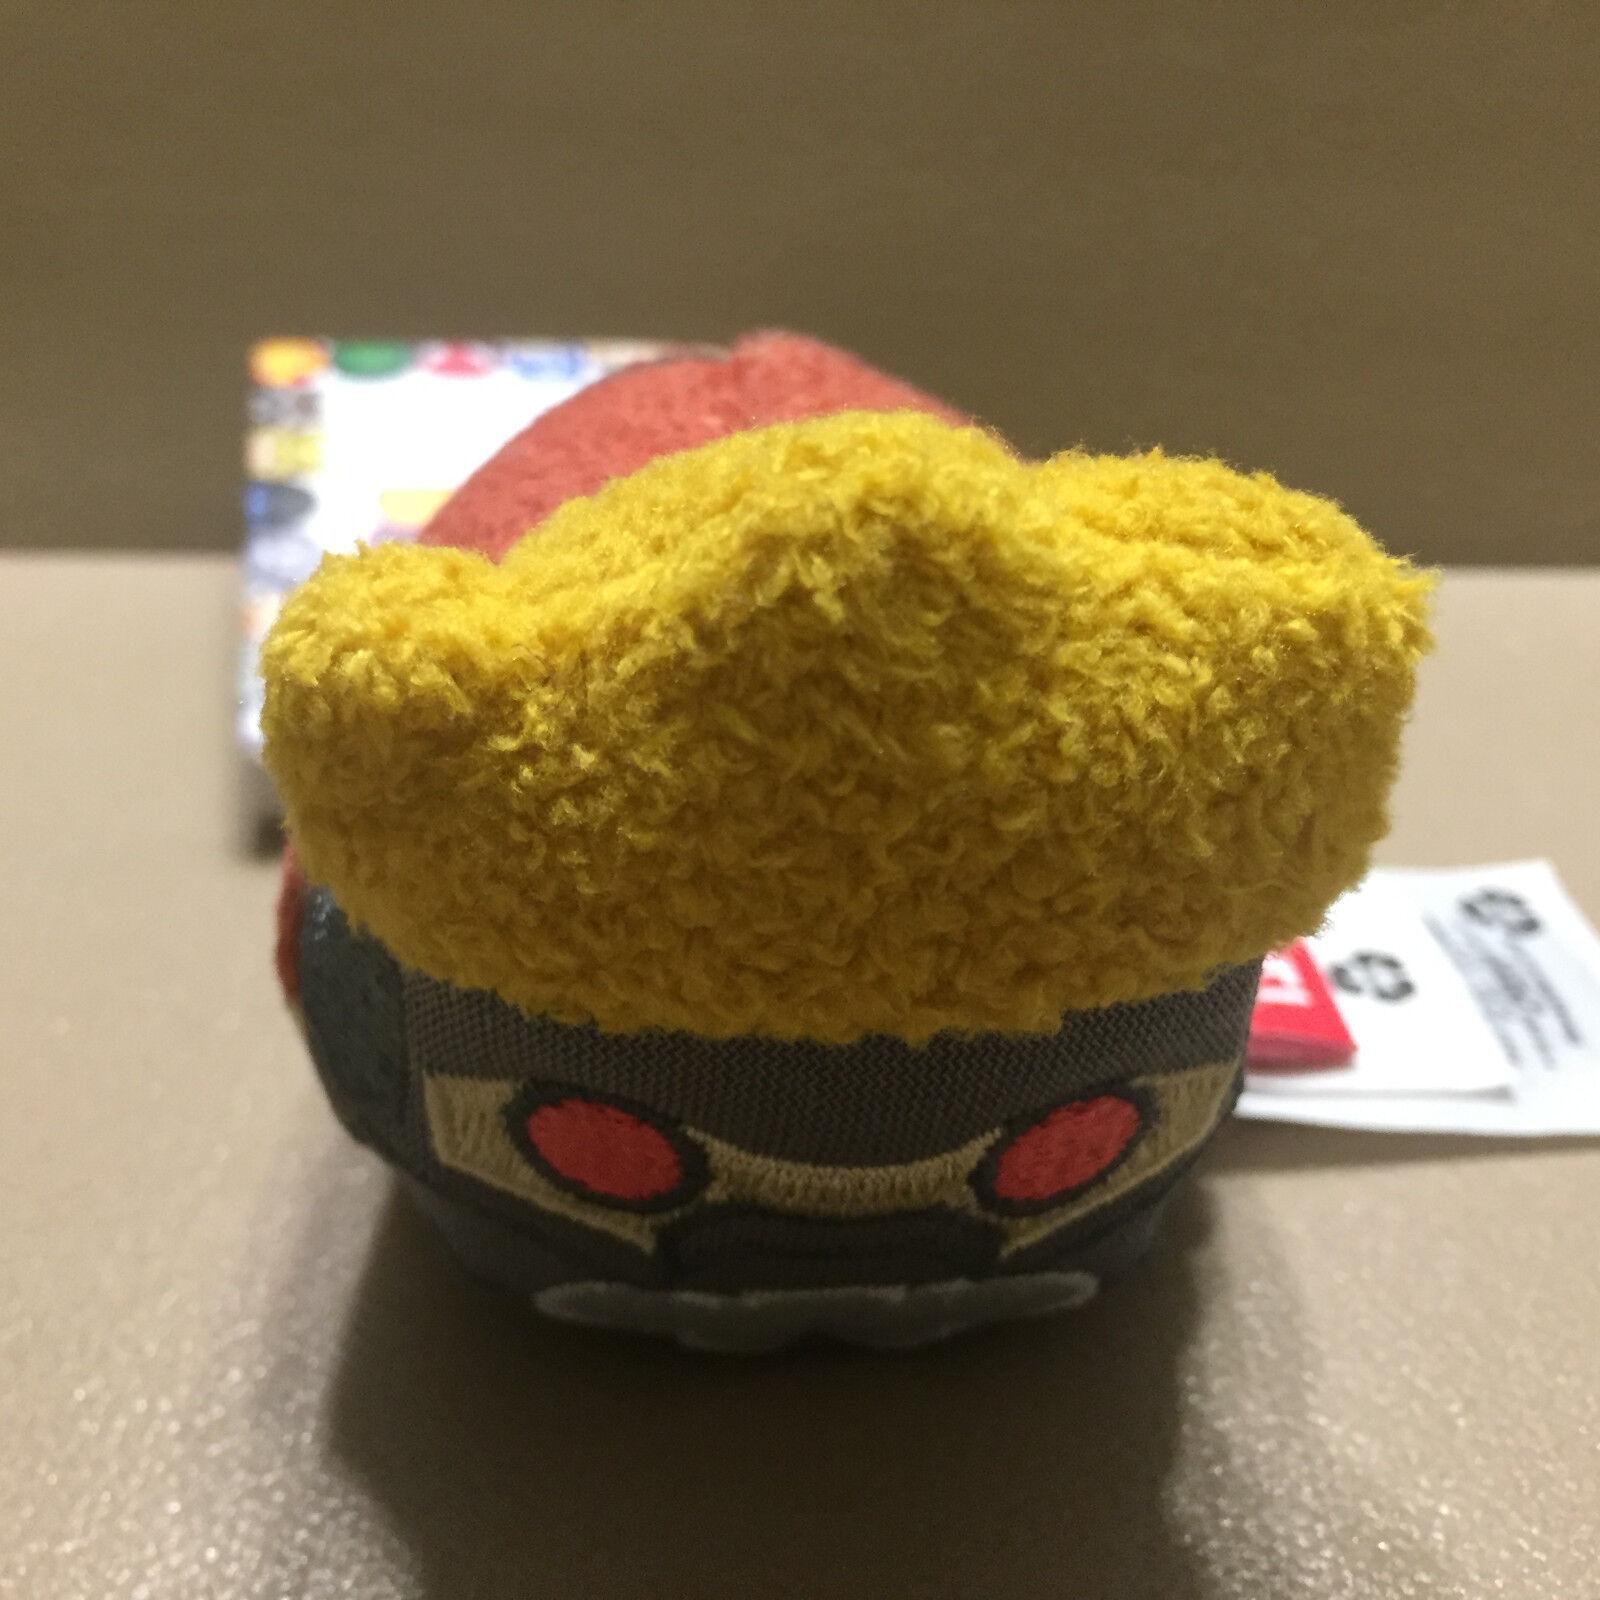 Authentic Disney/Marvel Star Lord Gamora Plush Tsum Tsum - $3.95